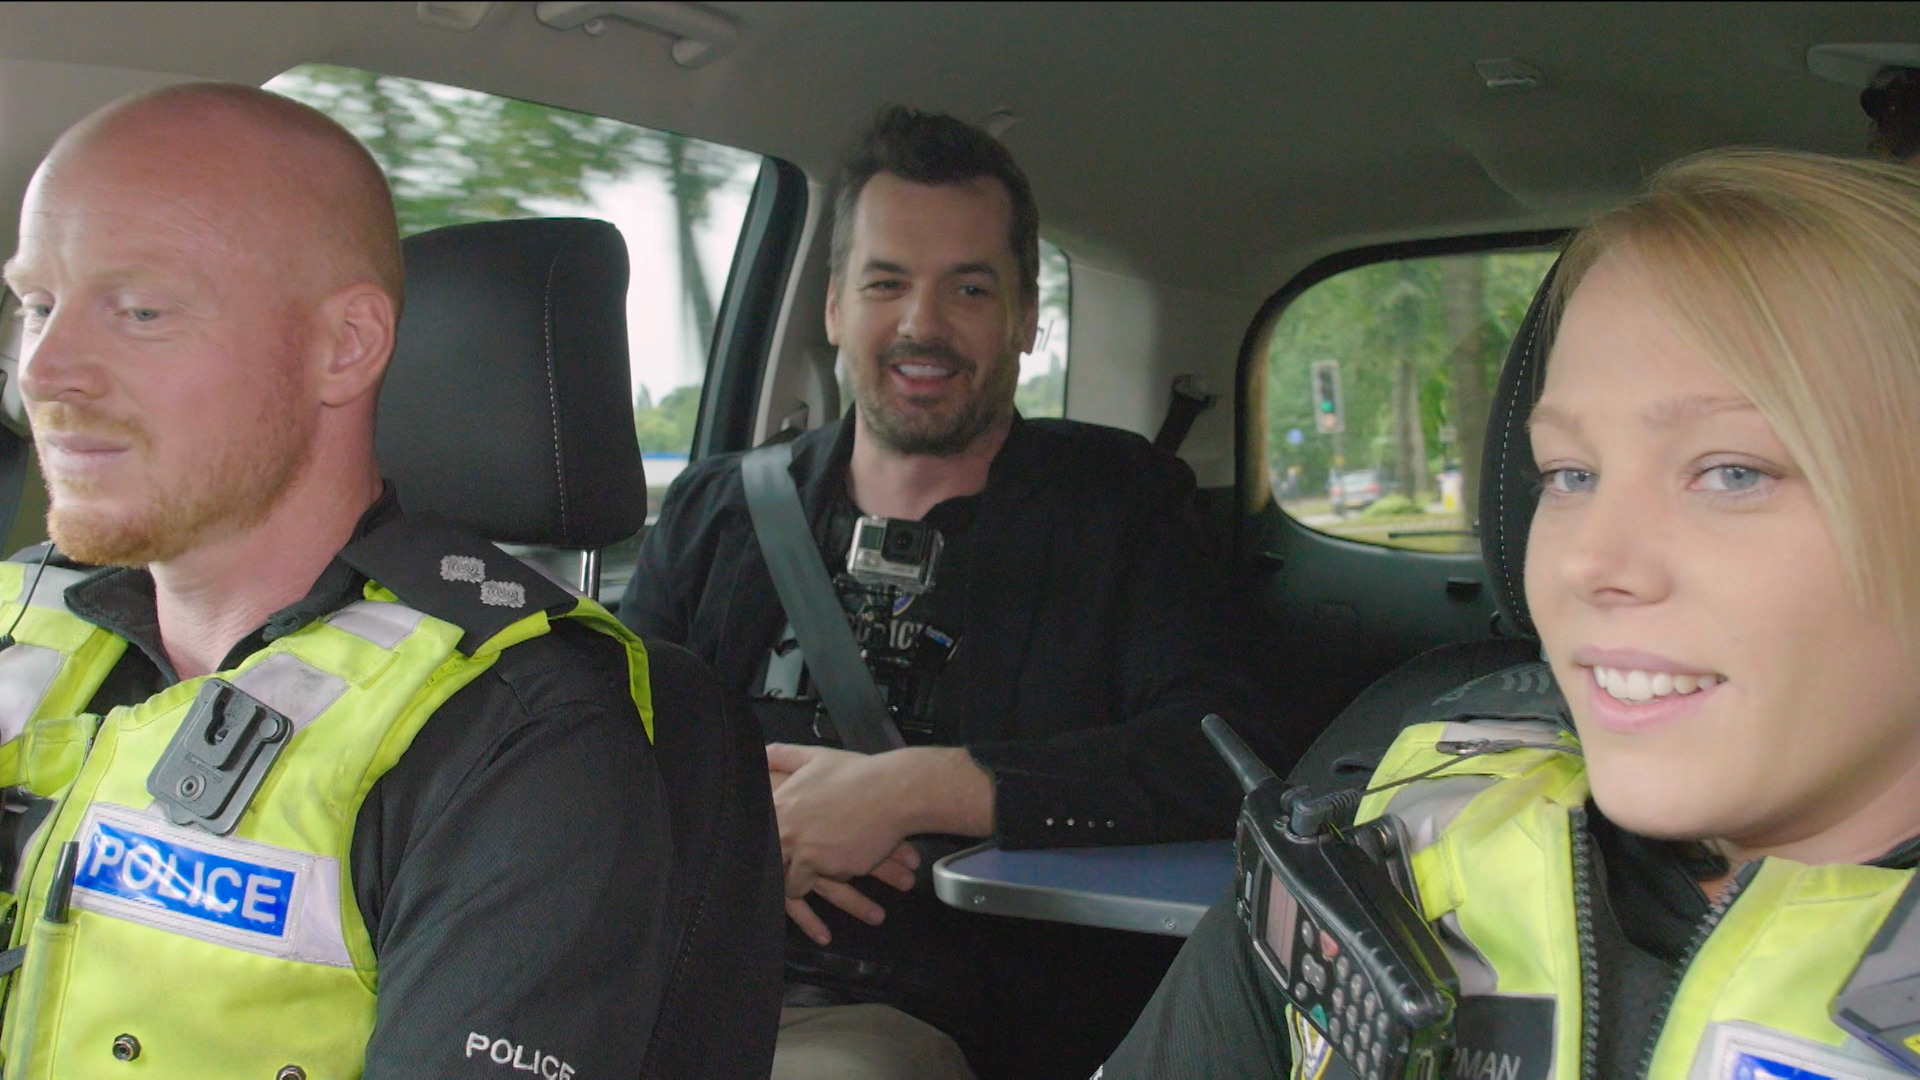 September 19, 2017 - Jim's Police Ride-Along